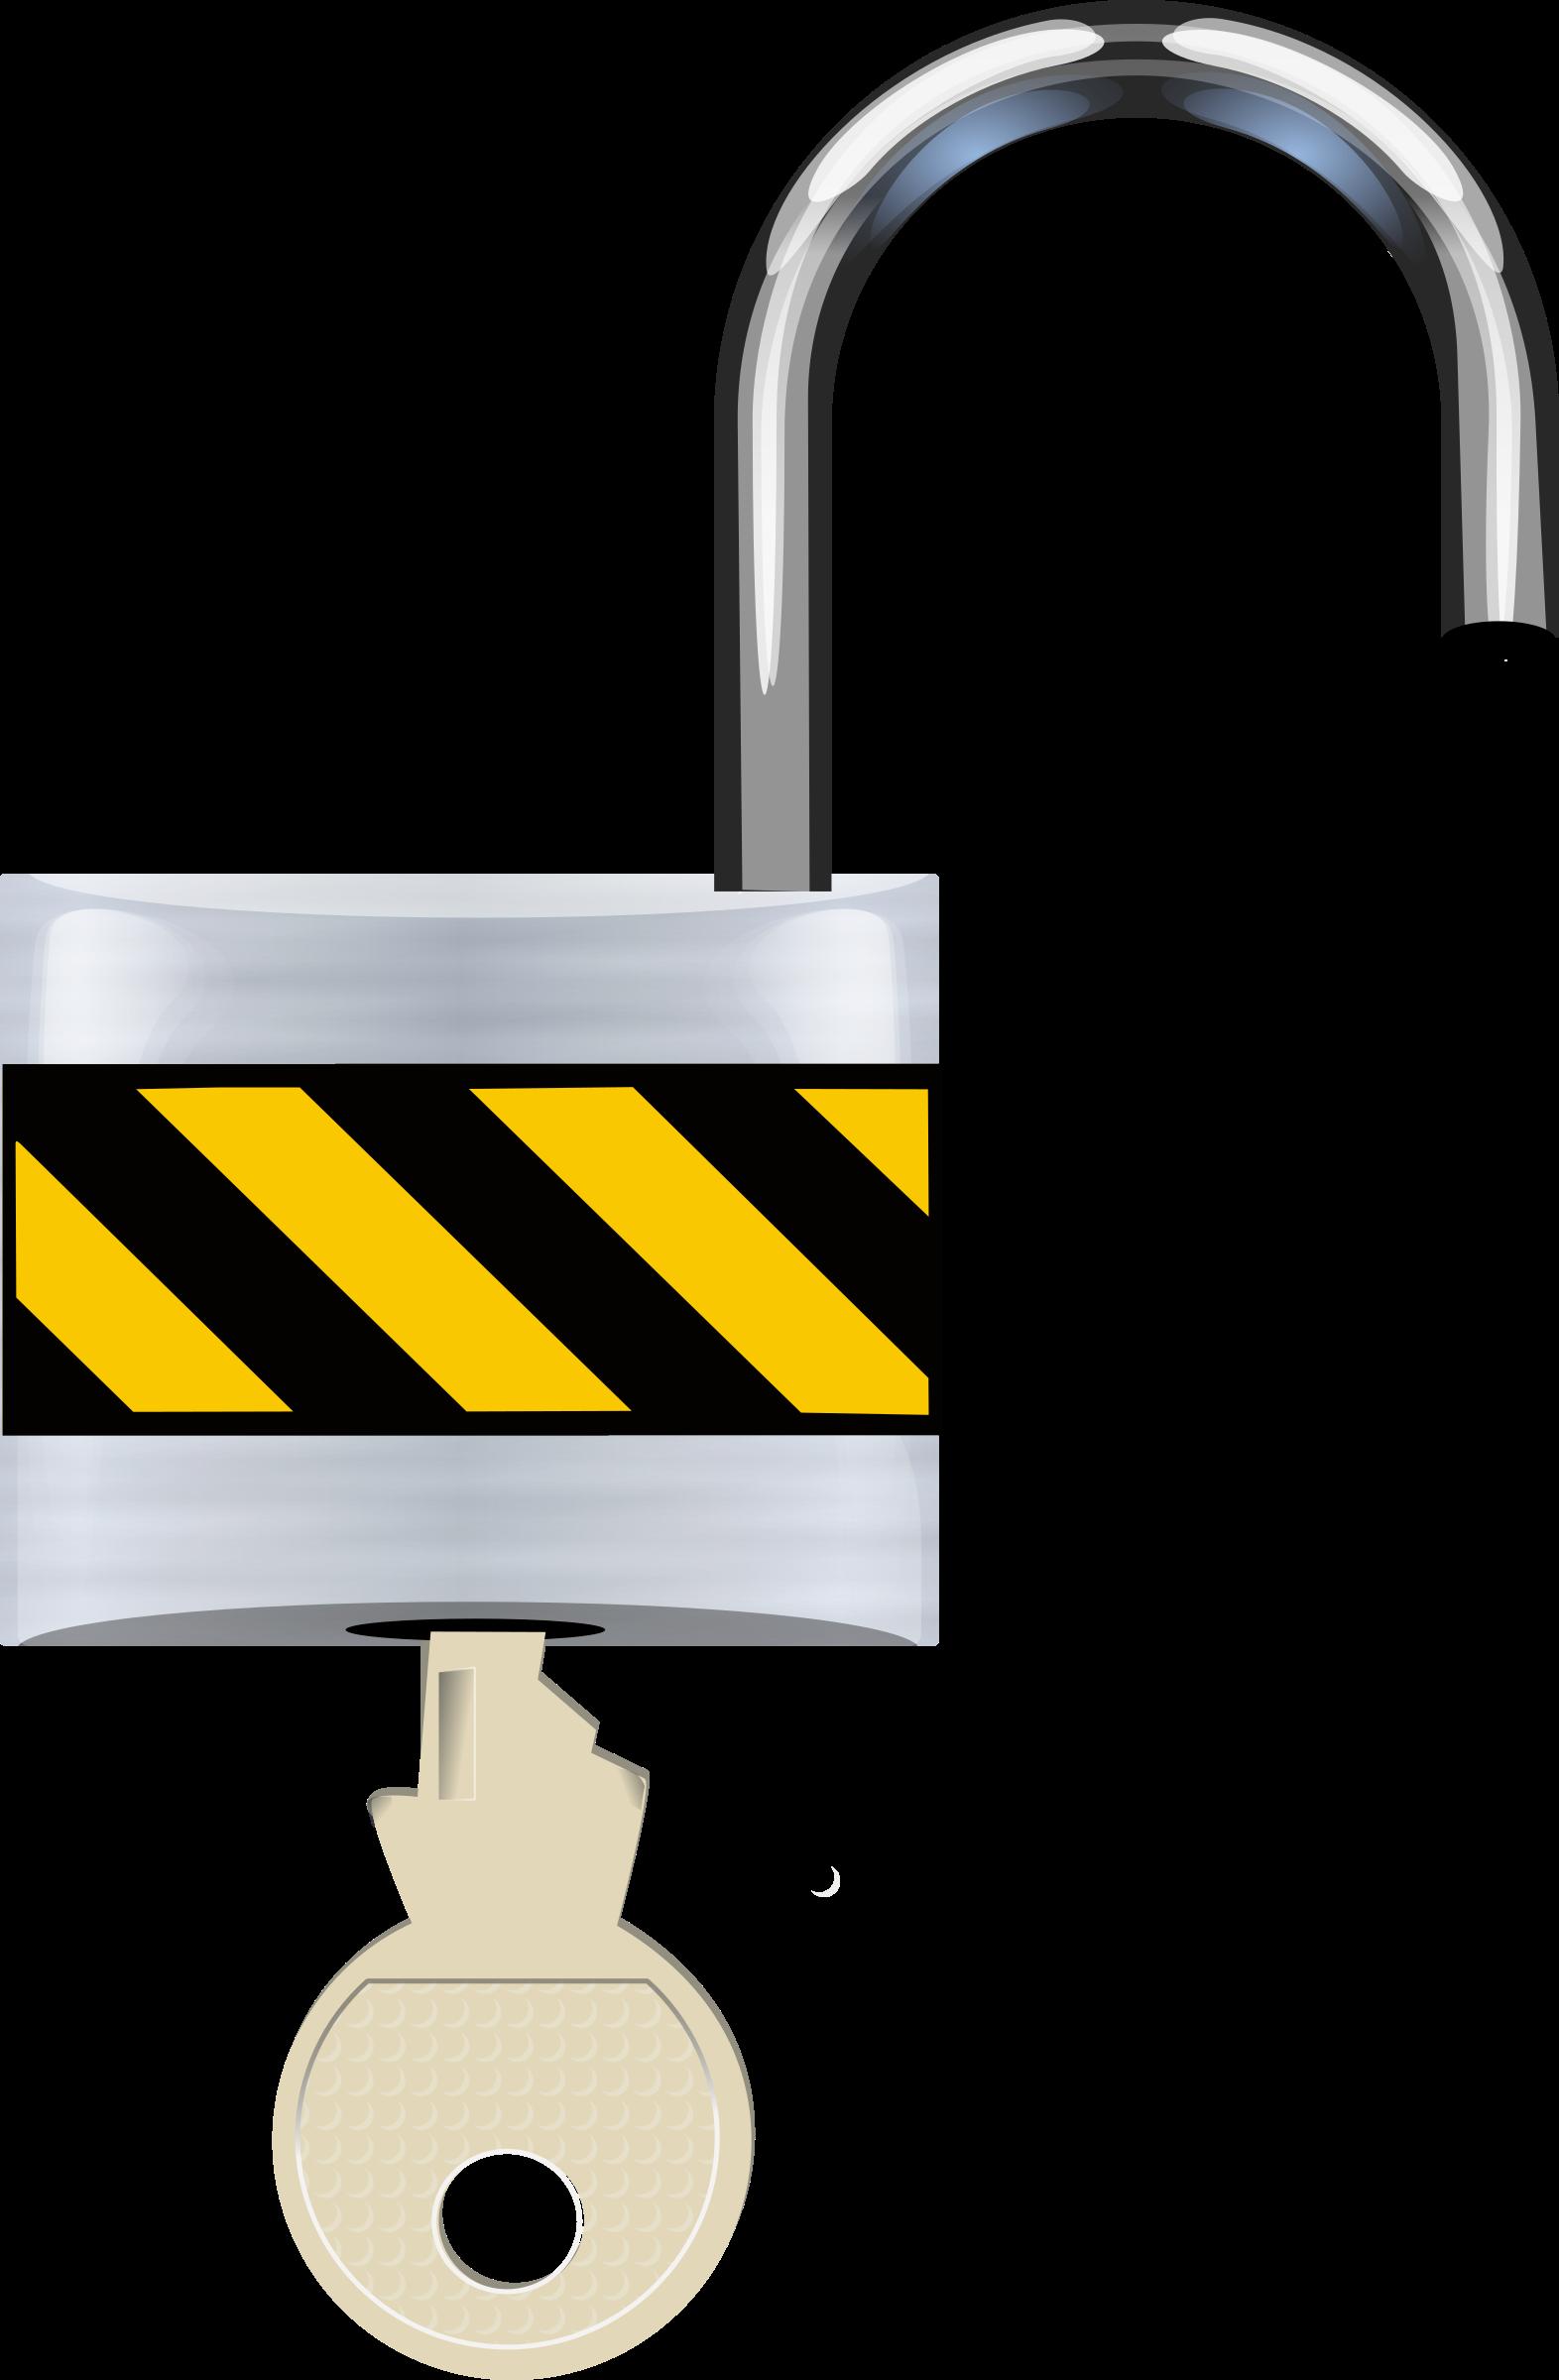 Padlock clipart unlocked padlock. Open icons png free